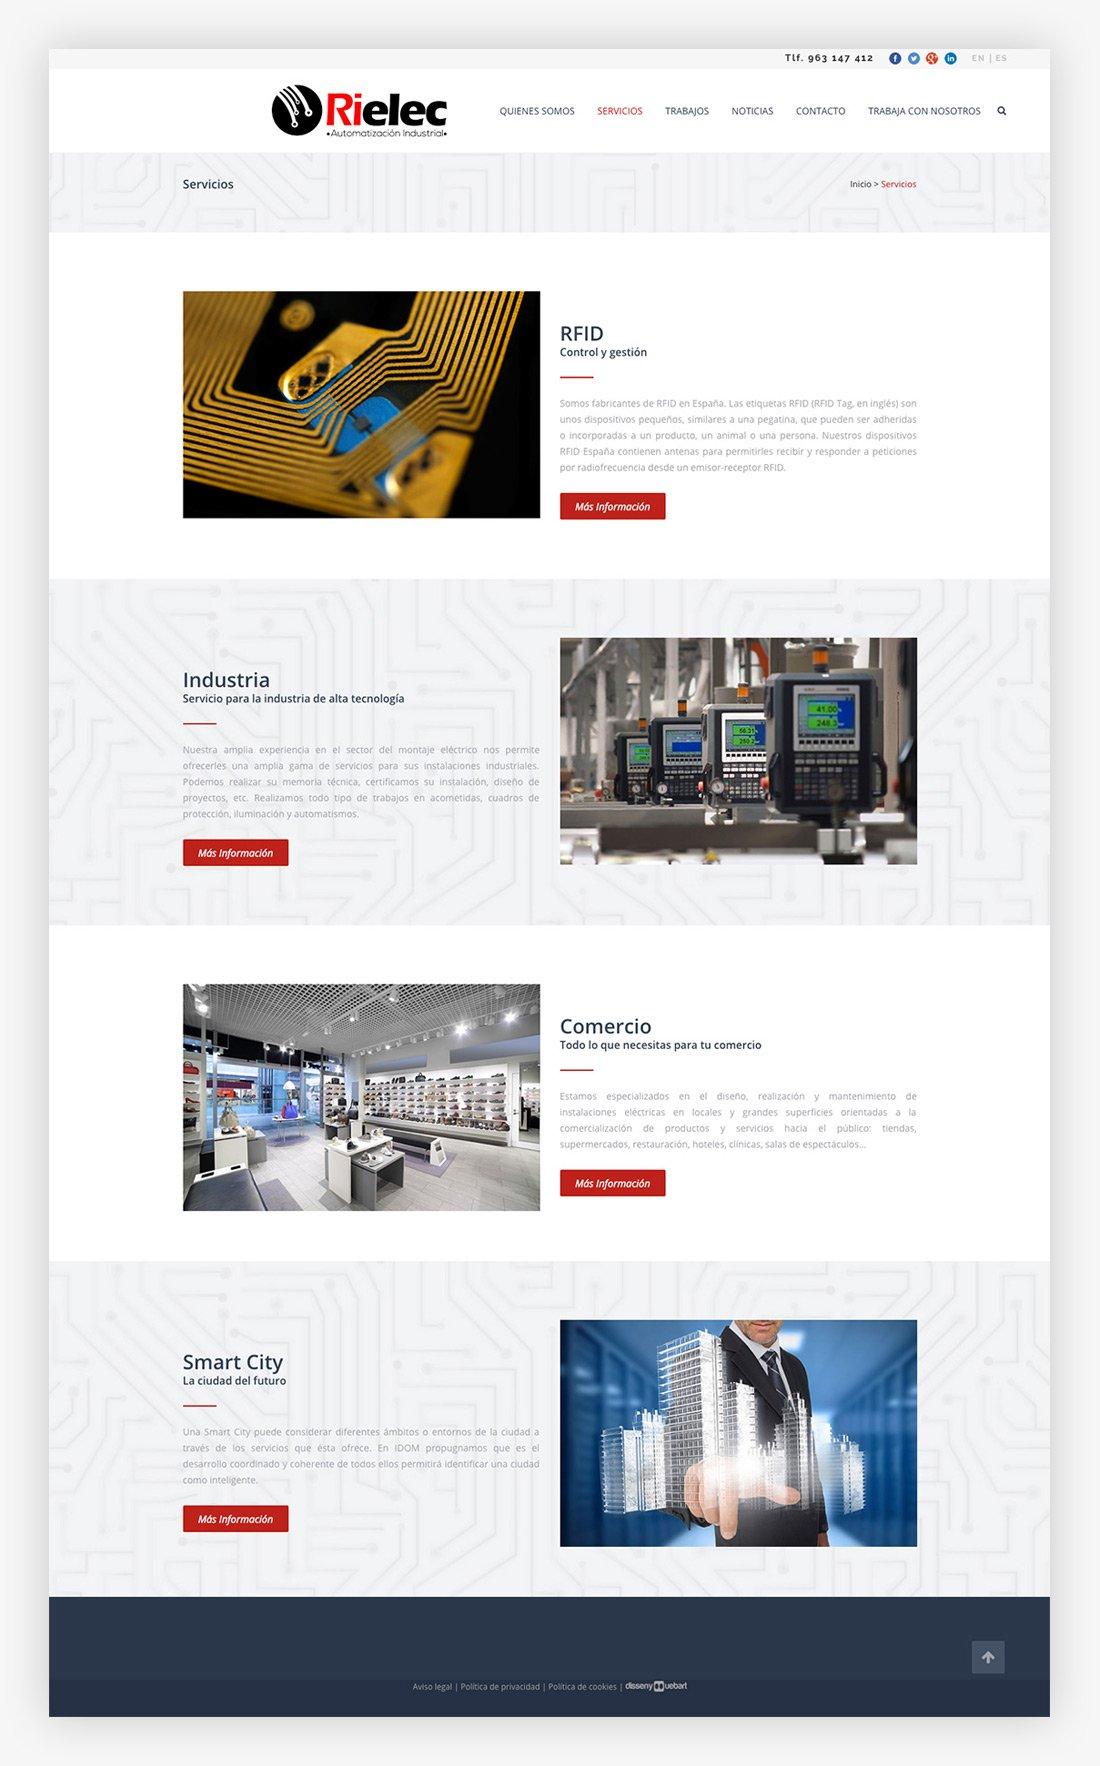 Diseño web Ontinyent. Rielec